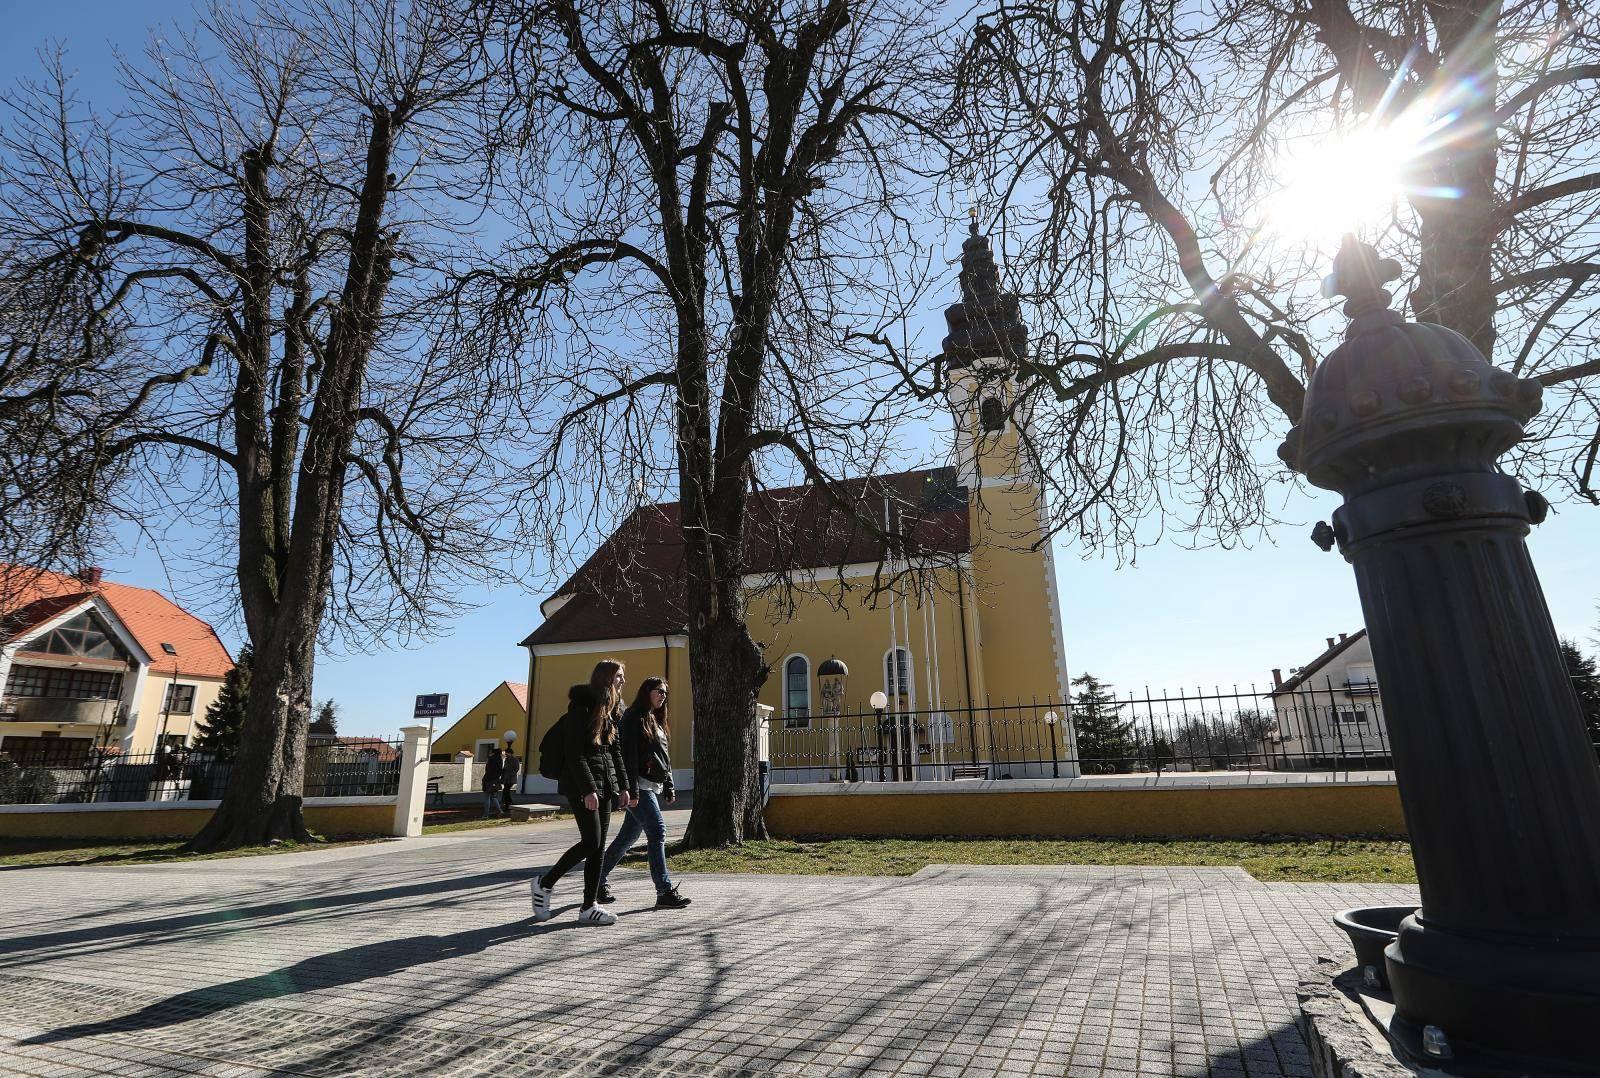 Grad od 8000 stanovnika ima tek 80 nezaposlenih: 'To je raj'